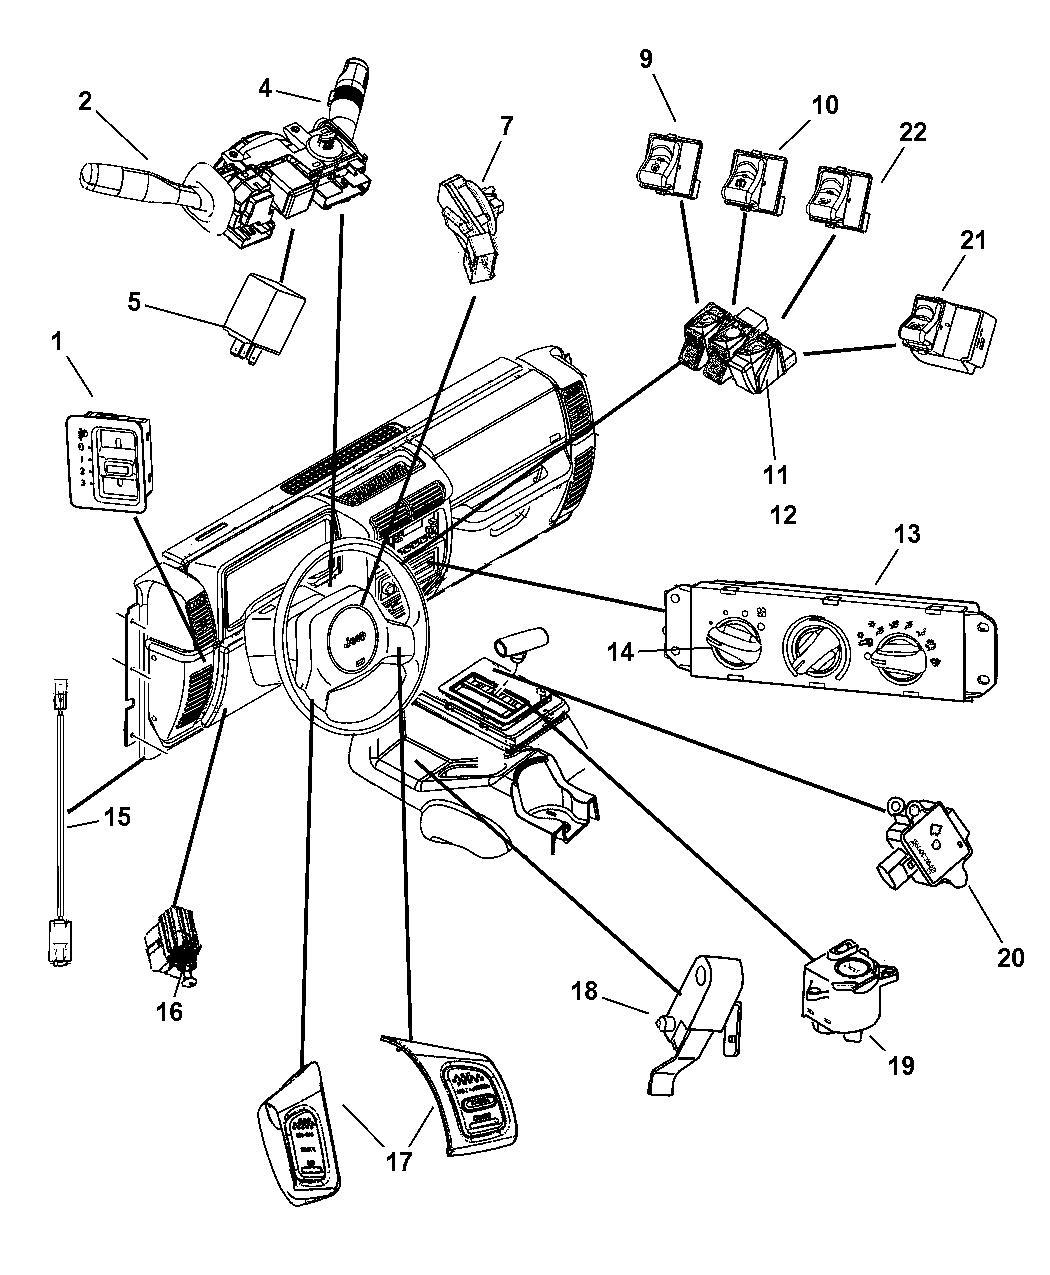 2001 Jeep Wrangler Heater Control Panel Wiring Diagram